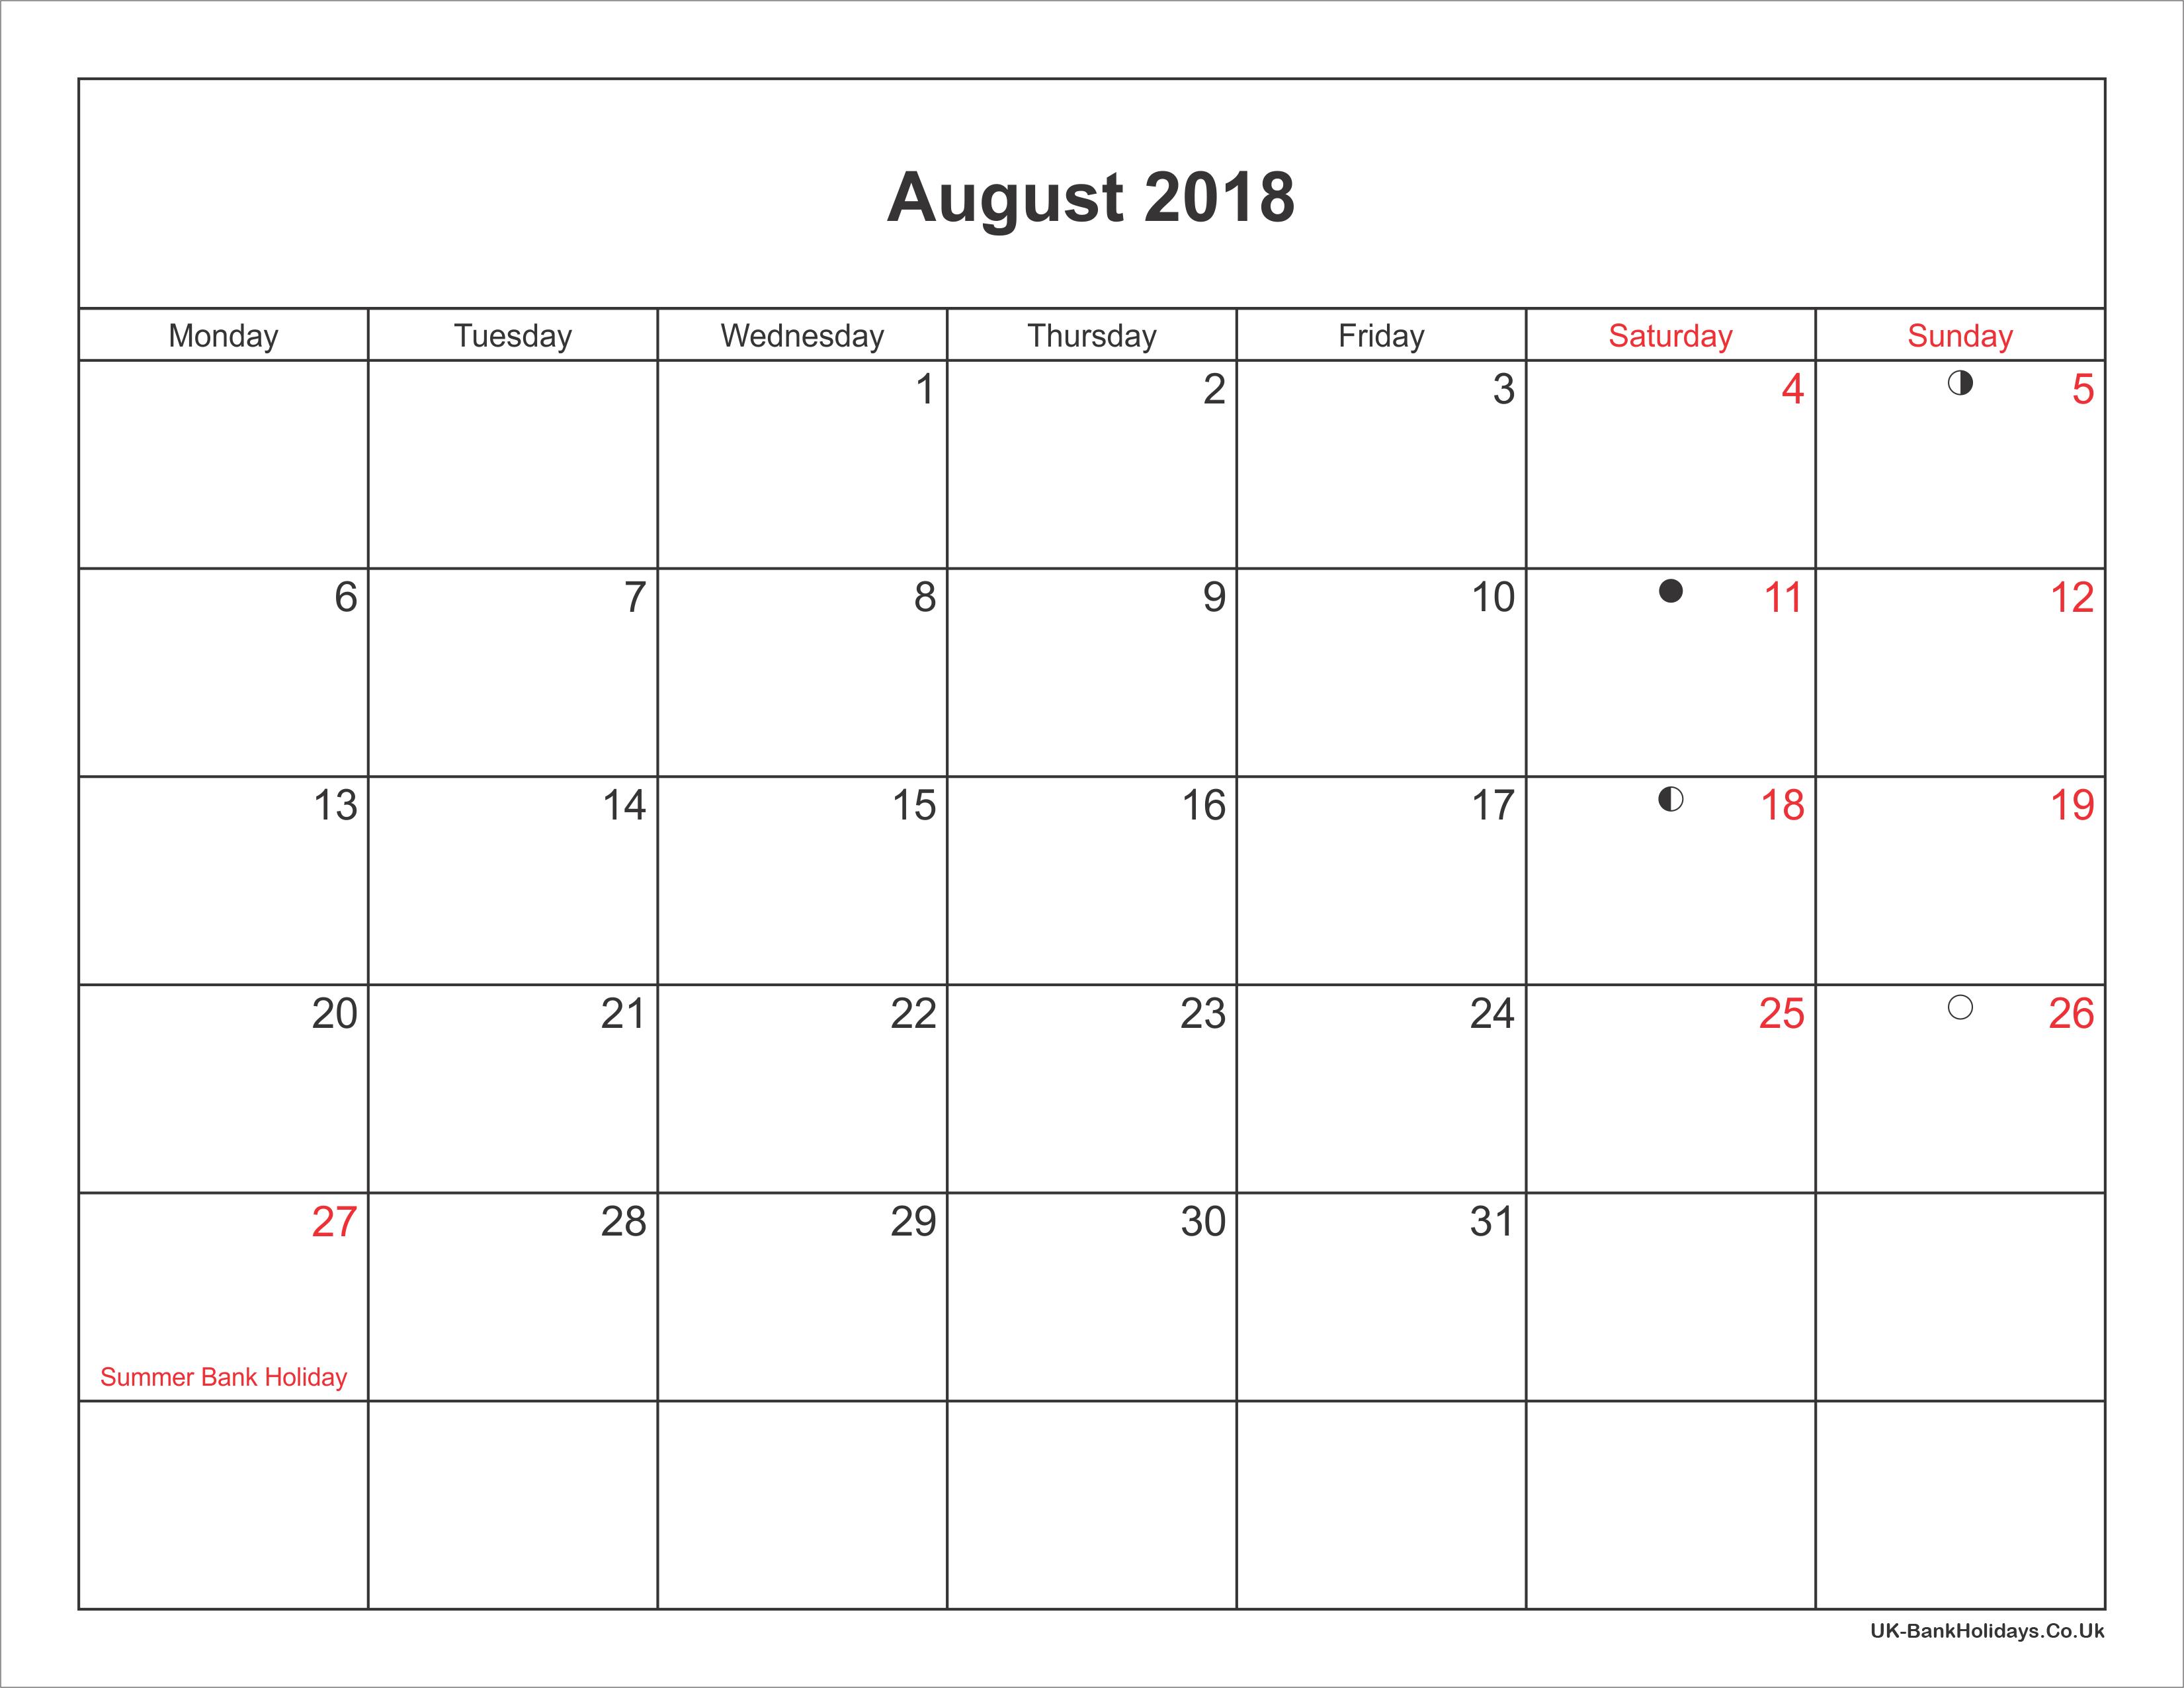 august 2018 calendar printable with bank holidays uk. Black Bedroom Furniture Sets. Home Design Ideas